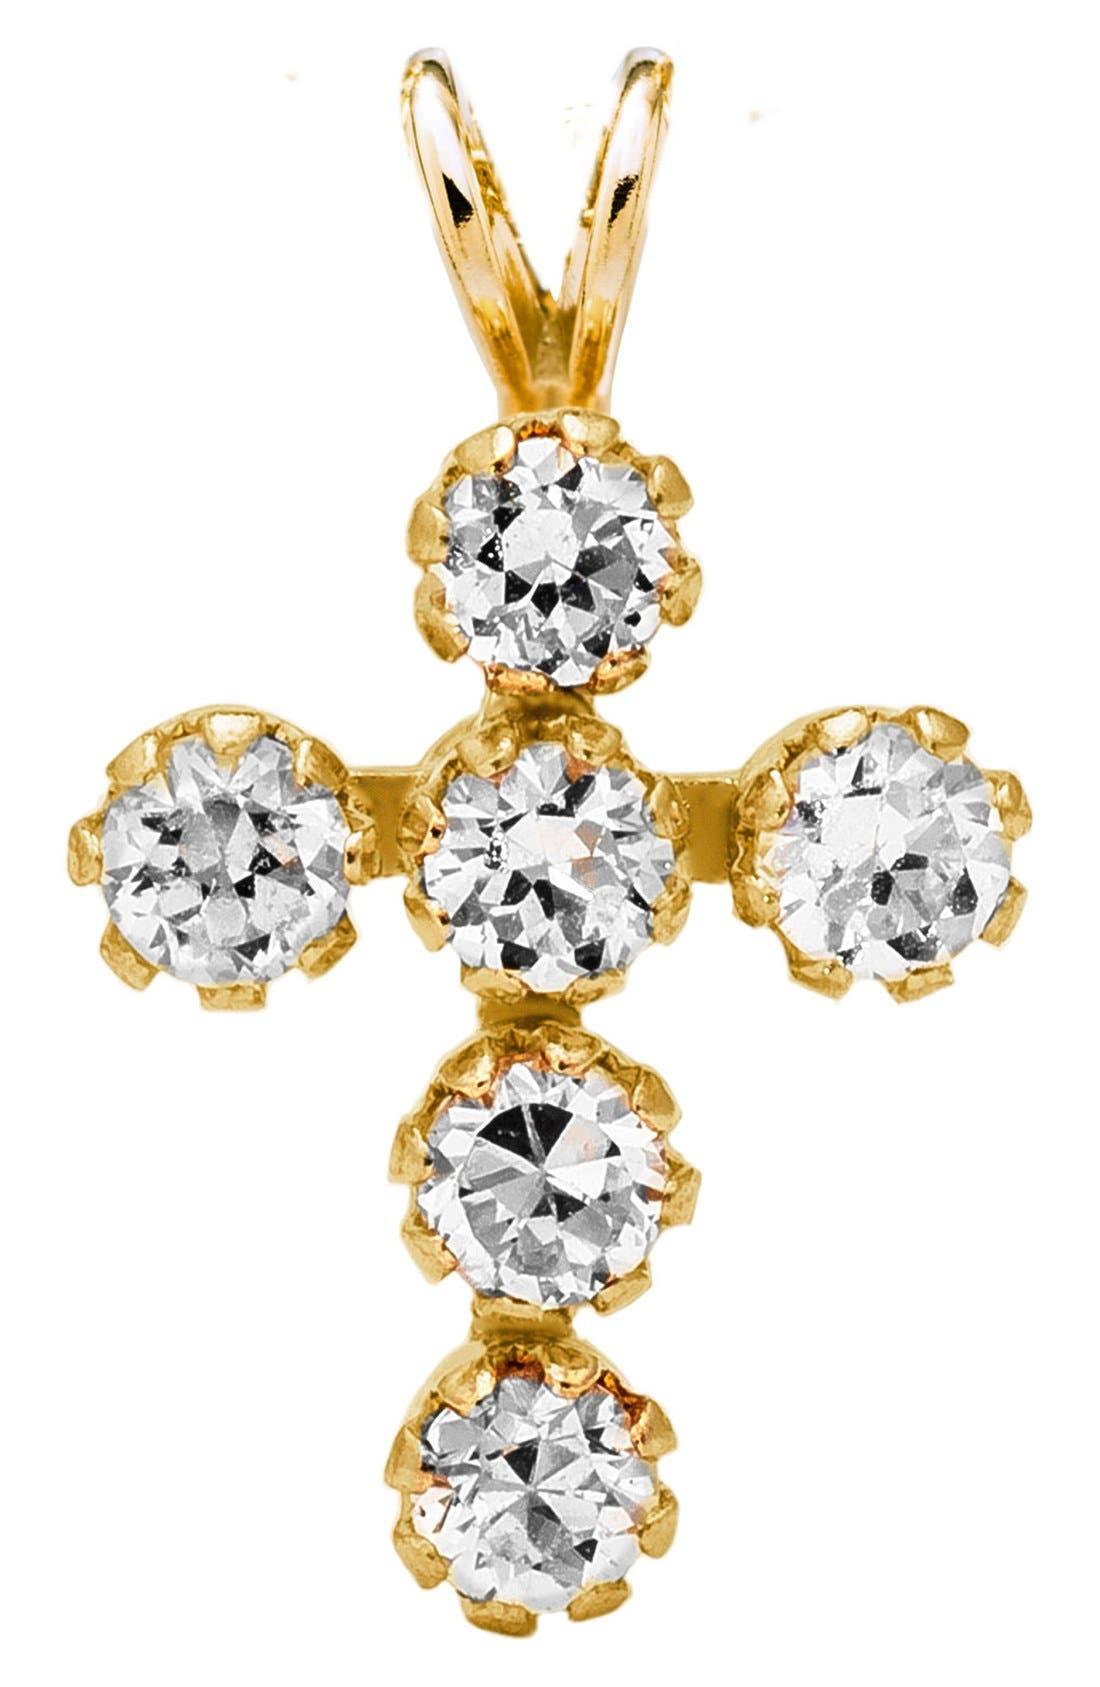 14k Gold & Cubic Zirconia Cross Necklace,                             Main thumbnail 1, color,                             710